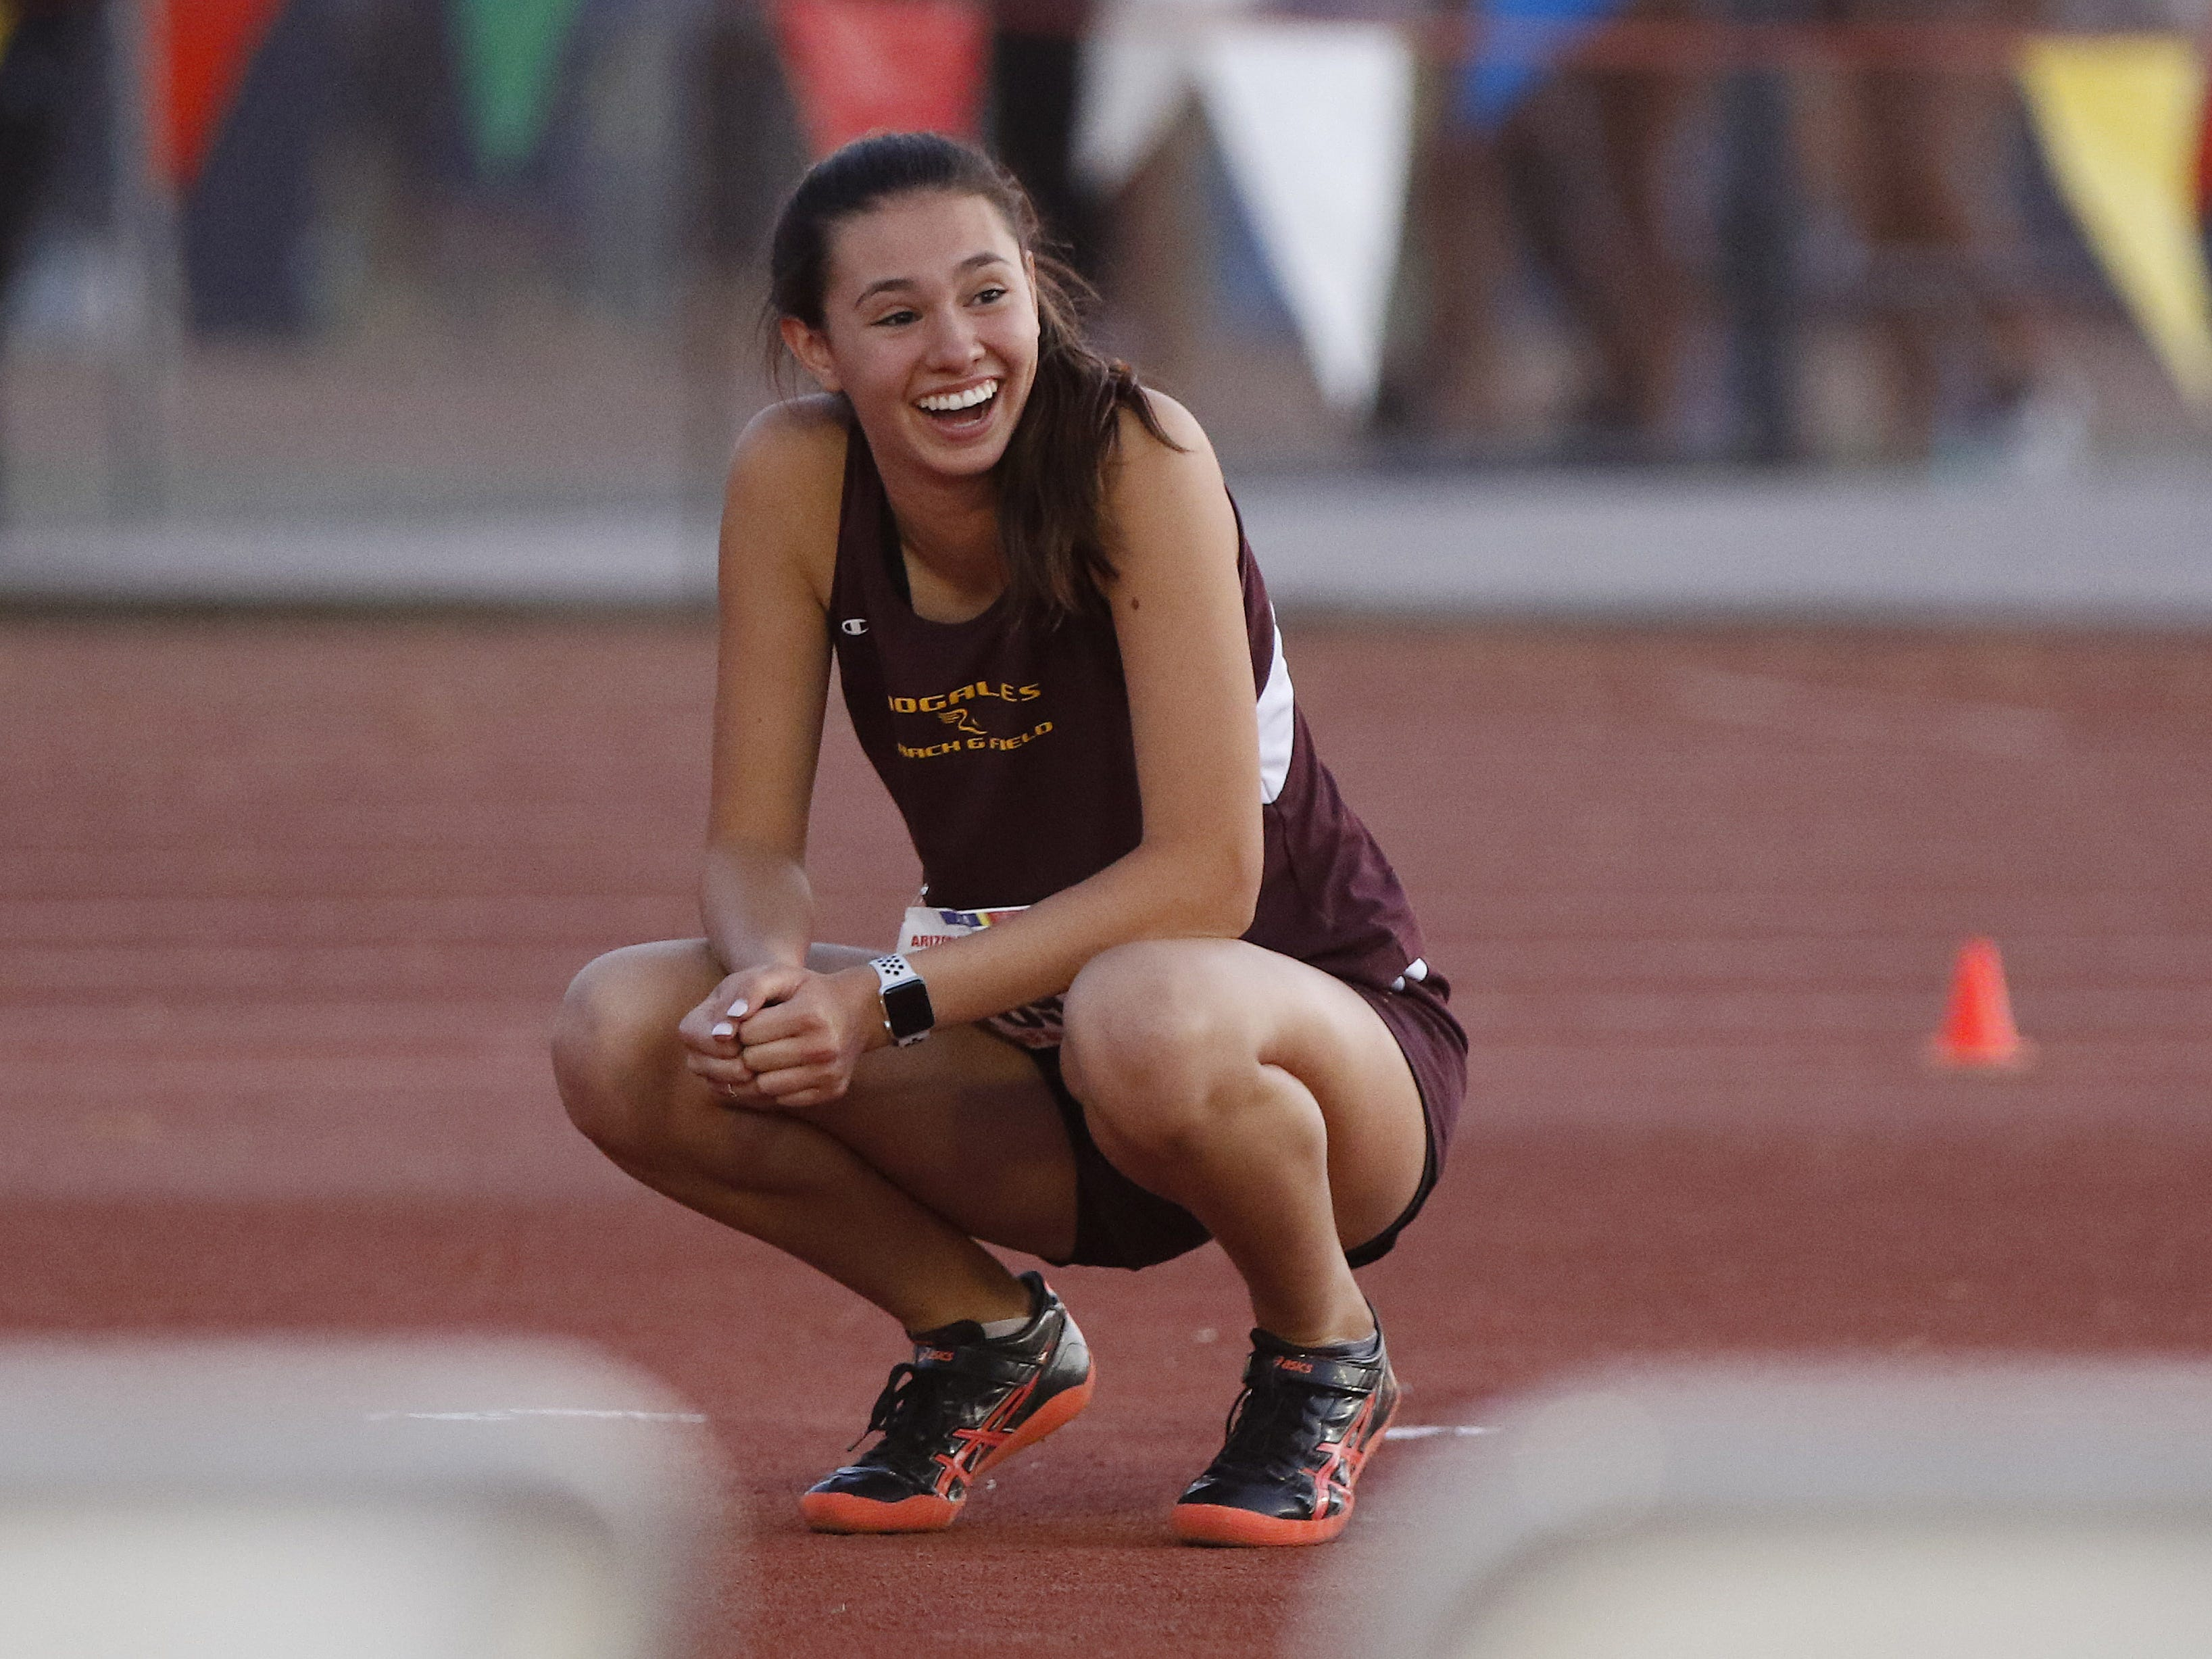 Nogale's Sabina Romero just realizes she won the Division II high jump championship during the 2019 Arizona State Track and Field Championship at Mesa Community College in Mesa, Arizona, May 04, 2019.